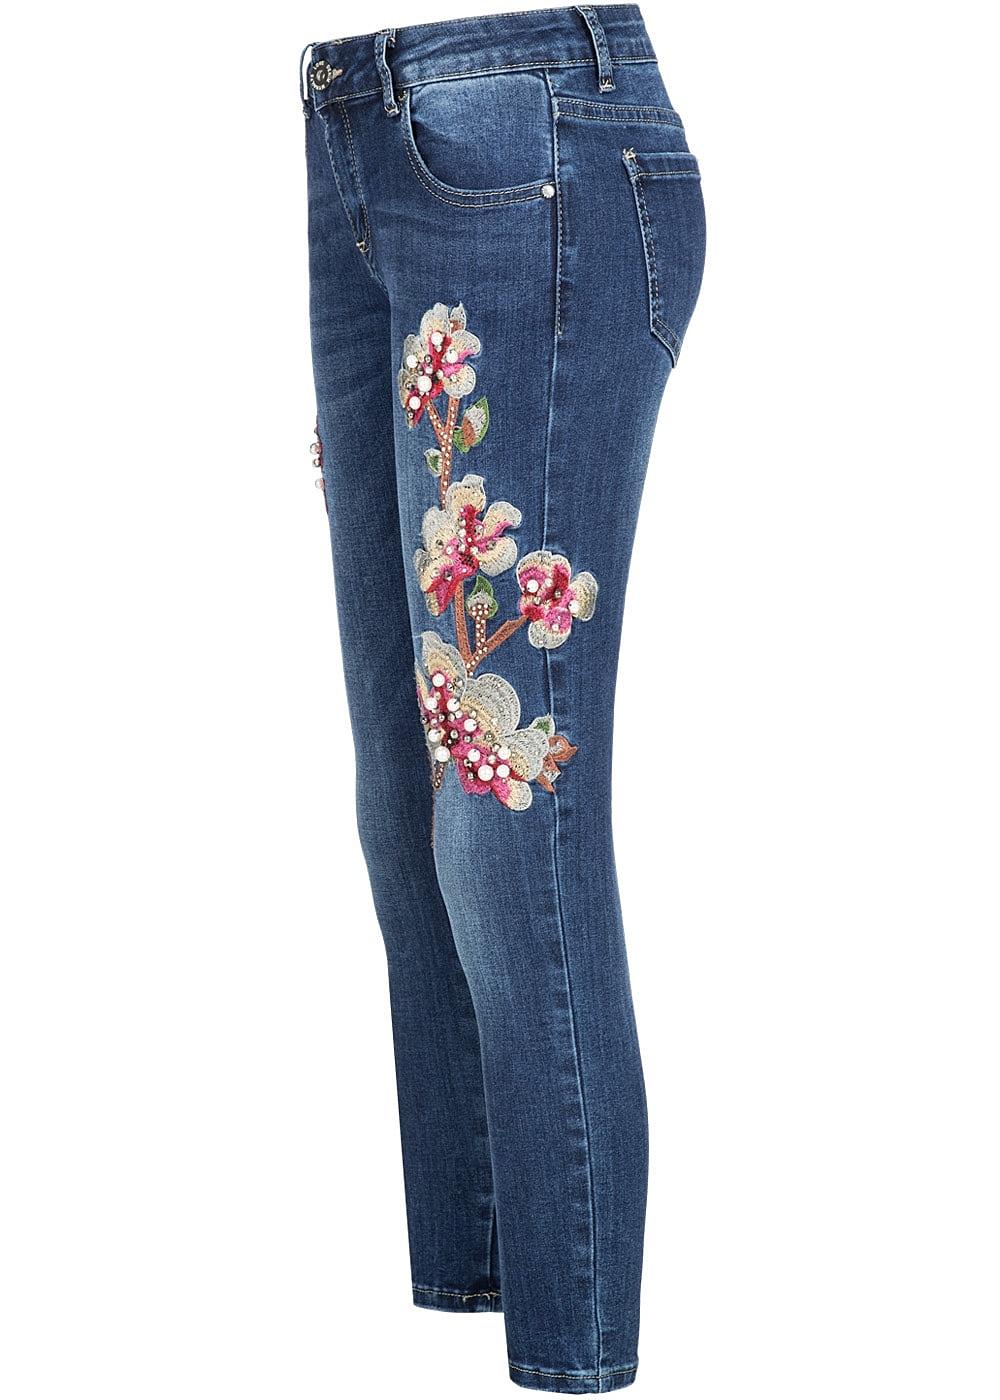 hailys damen 7 8 jeans hose blumen patch perlen strass knitter optik blau denim 77onlineshop. Black Bedroom Furniture Sets. Home Design Ideas